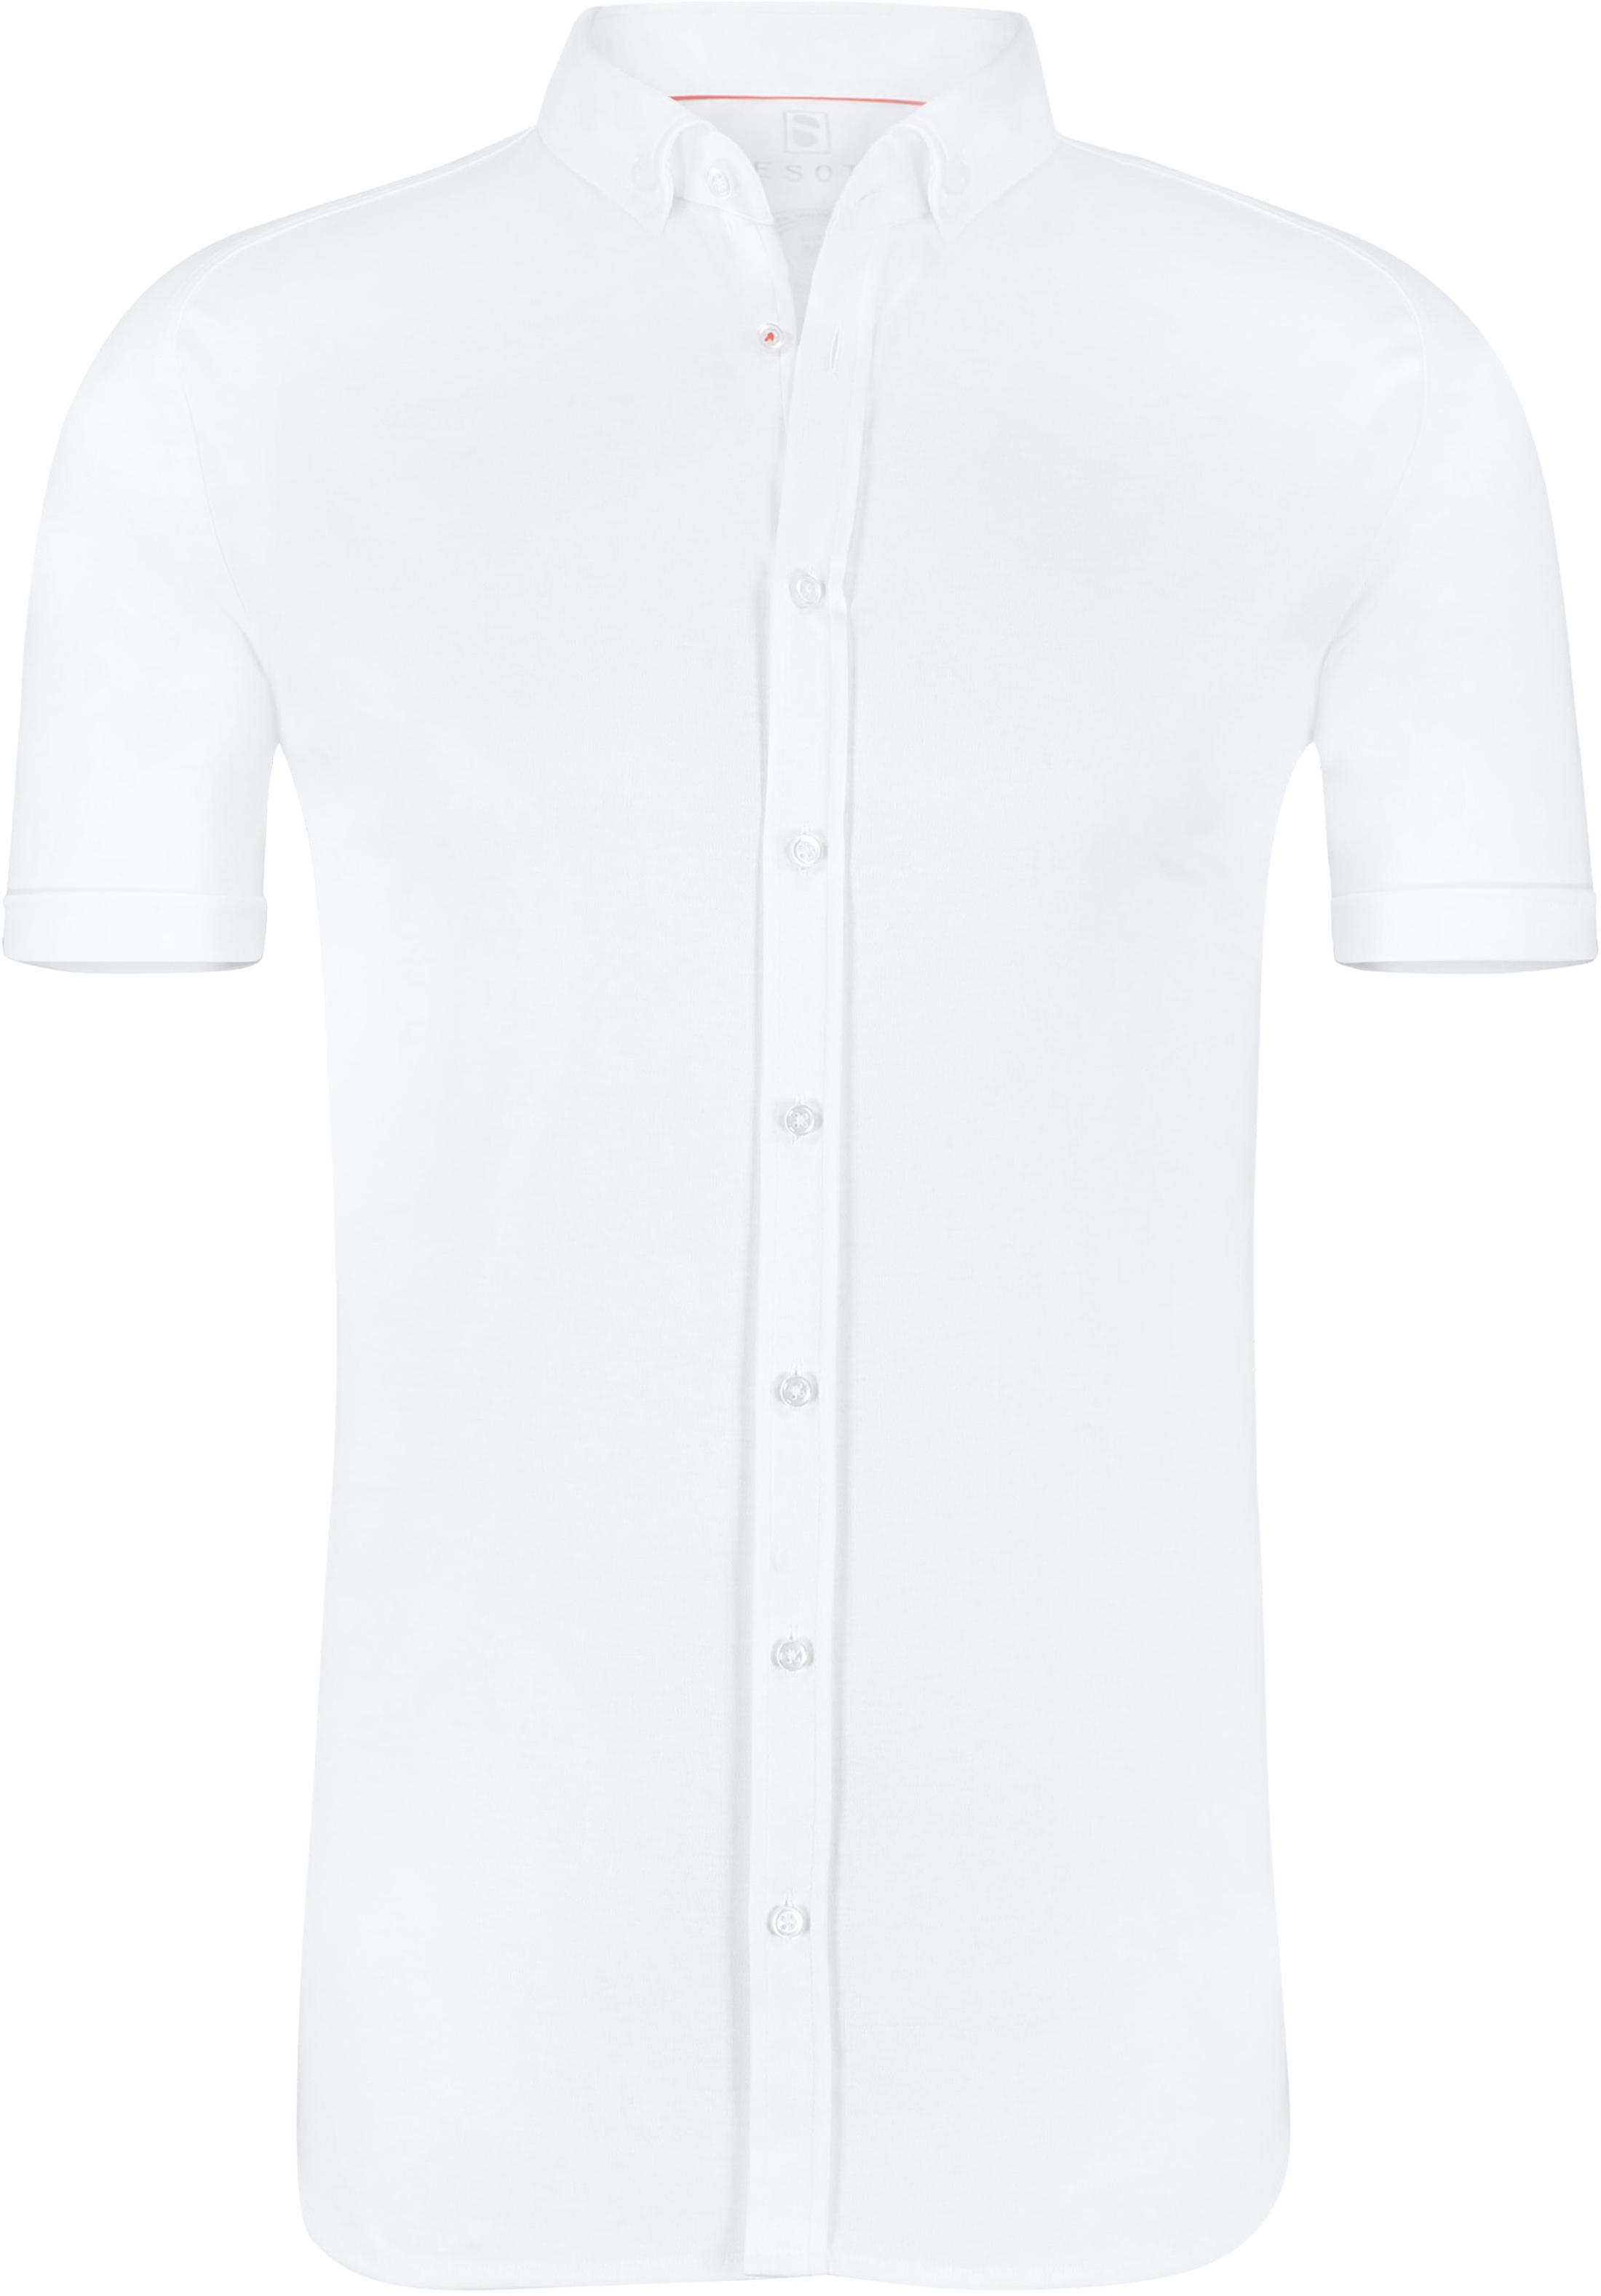 Desoto Overhemd Korte Mouw Wit foto 0